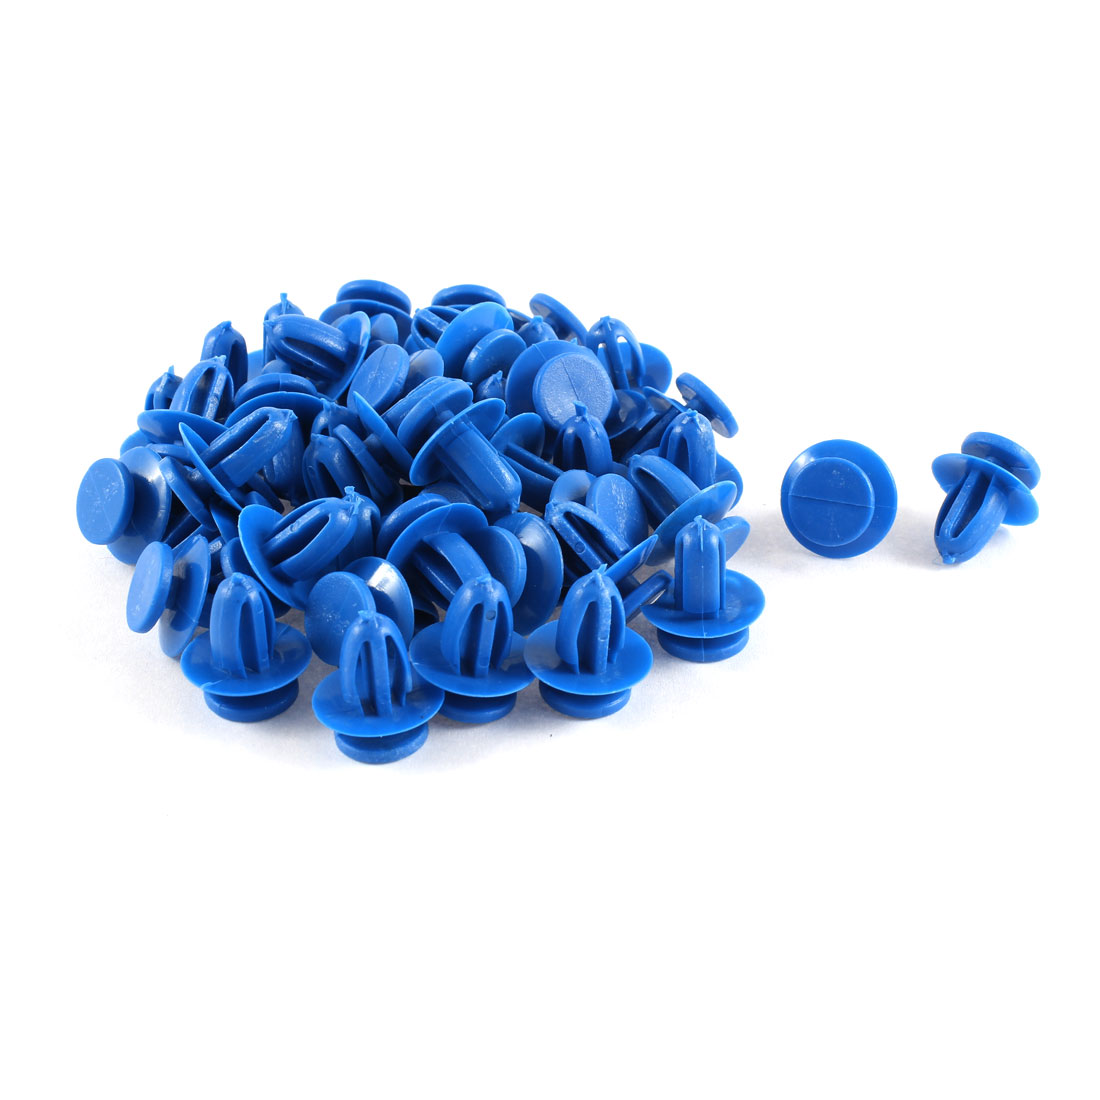 Unique Bargains 50 Pcs Blue Plastic Push in Fasteners Rivets Fender Clips 9mm Hole for